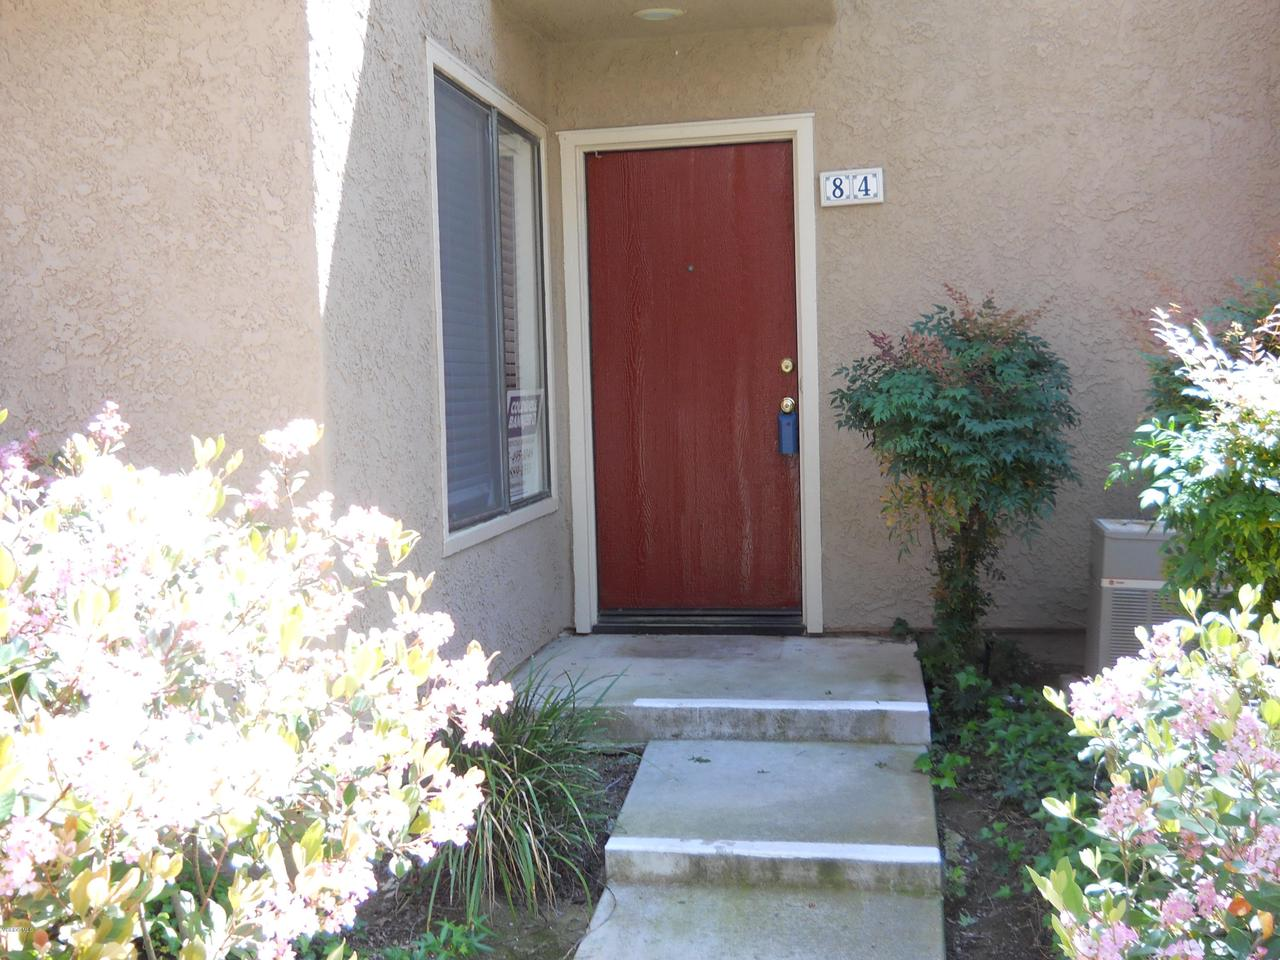 Photo of 2324 ARCHWOOD LANE #84, Simi Valley, CA 93063